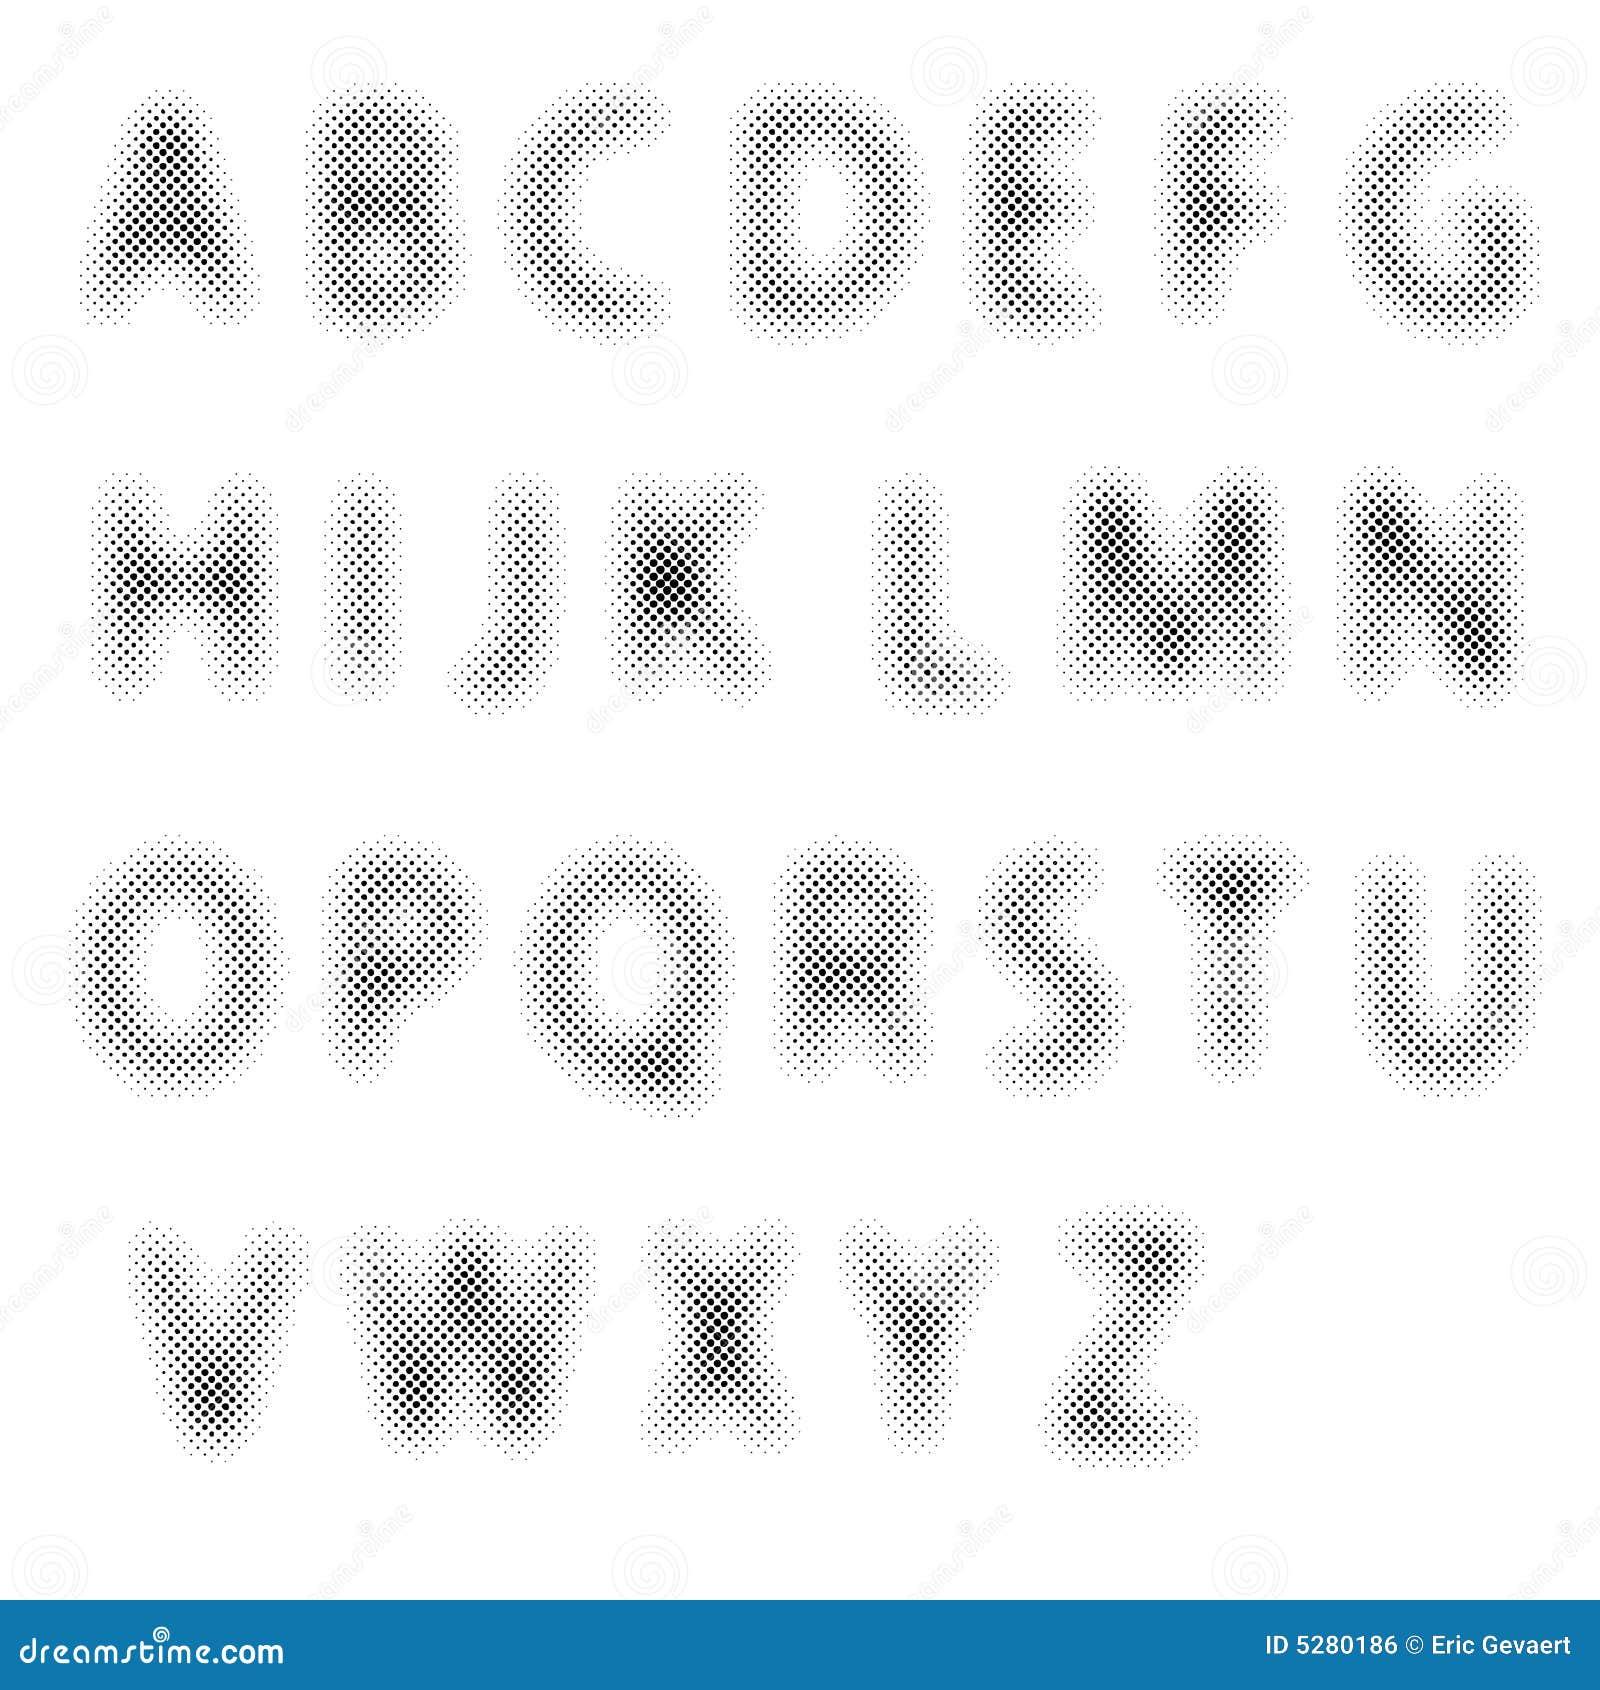 Letras de intervalo mínimo